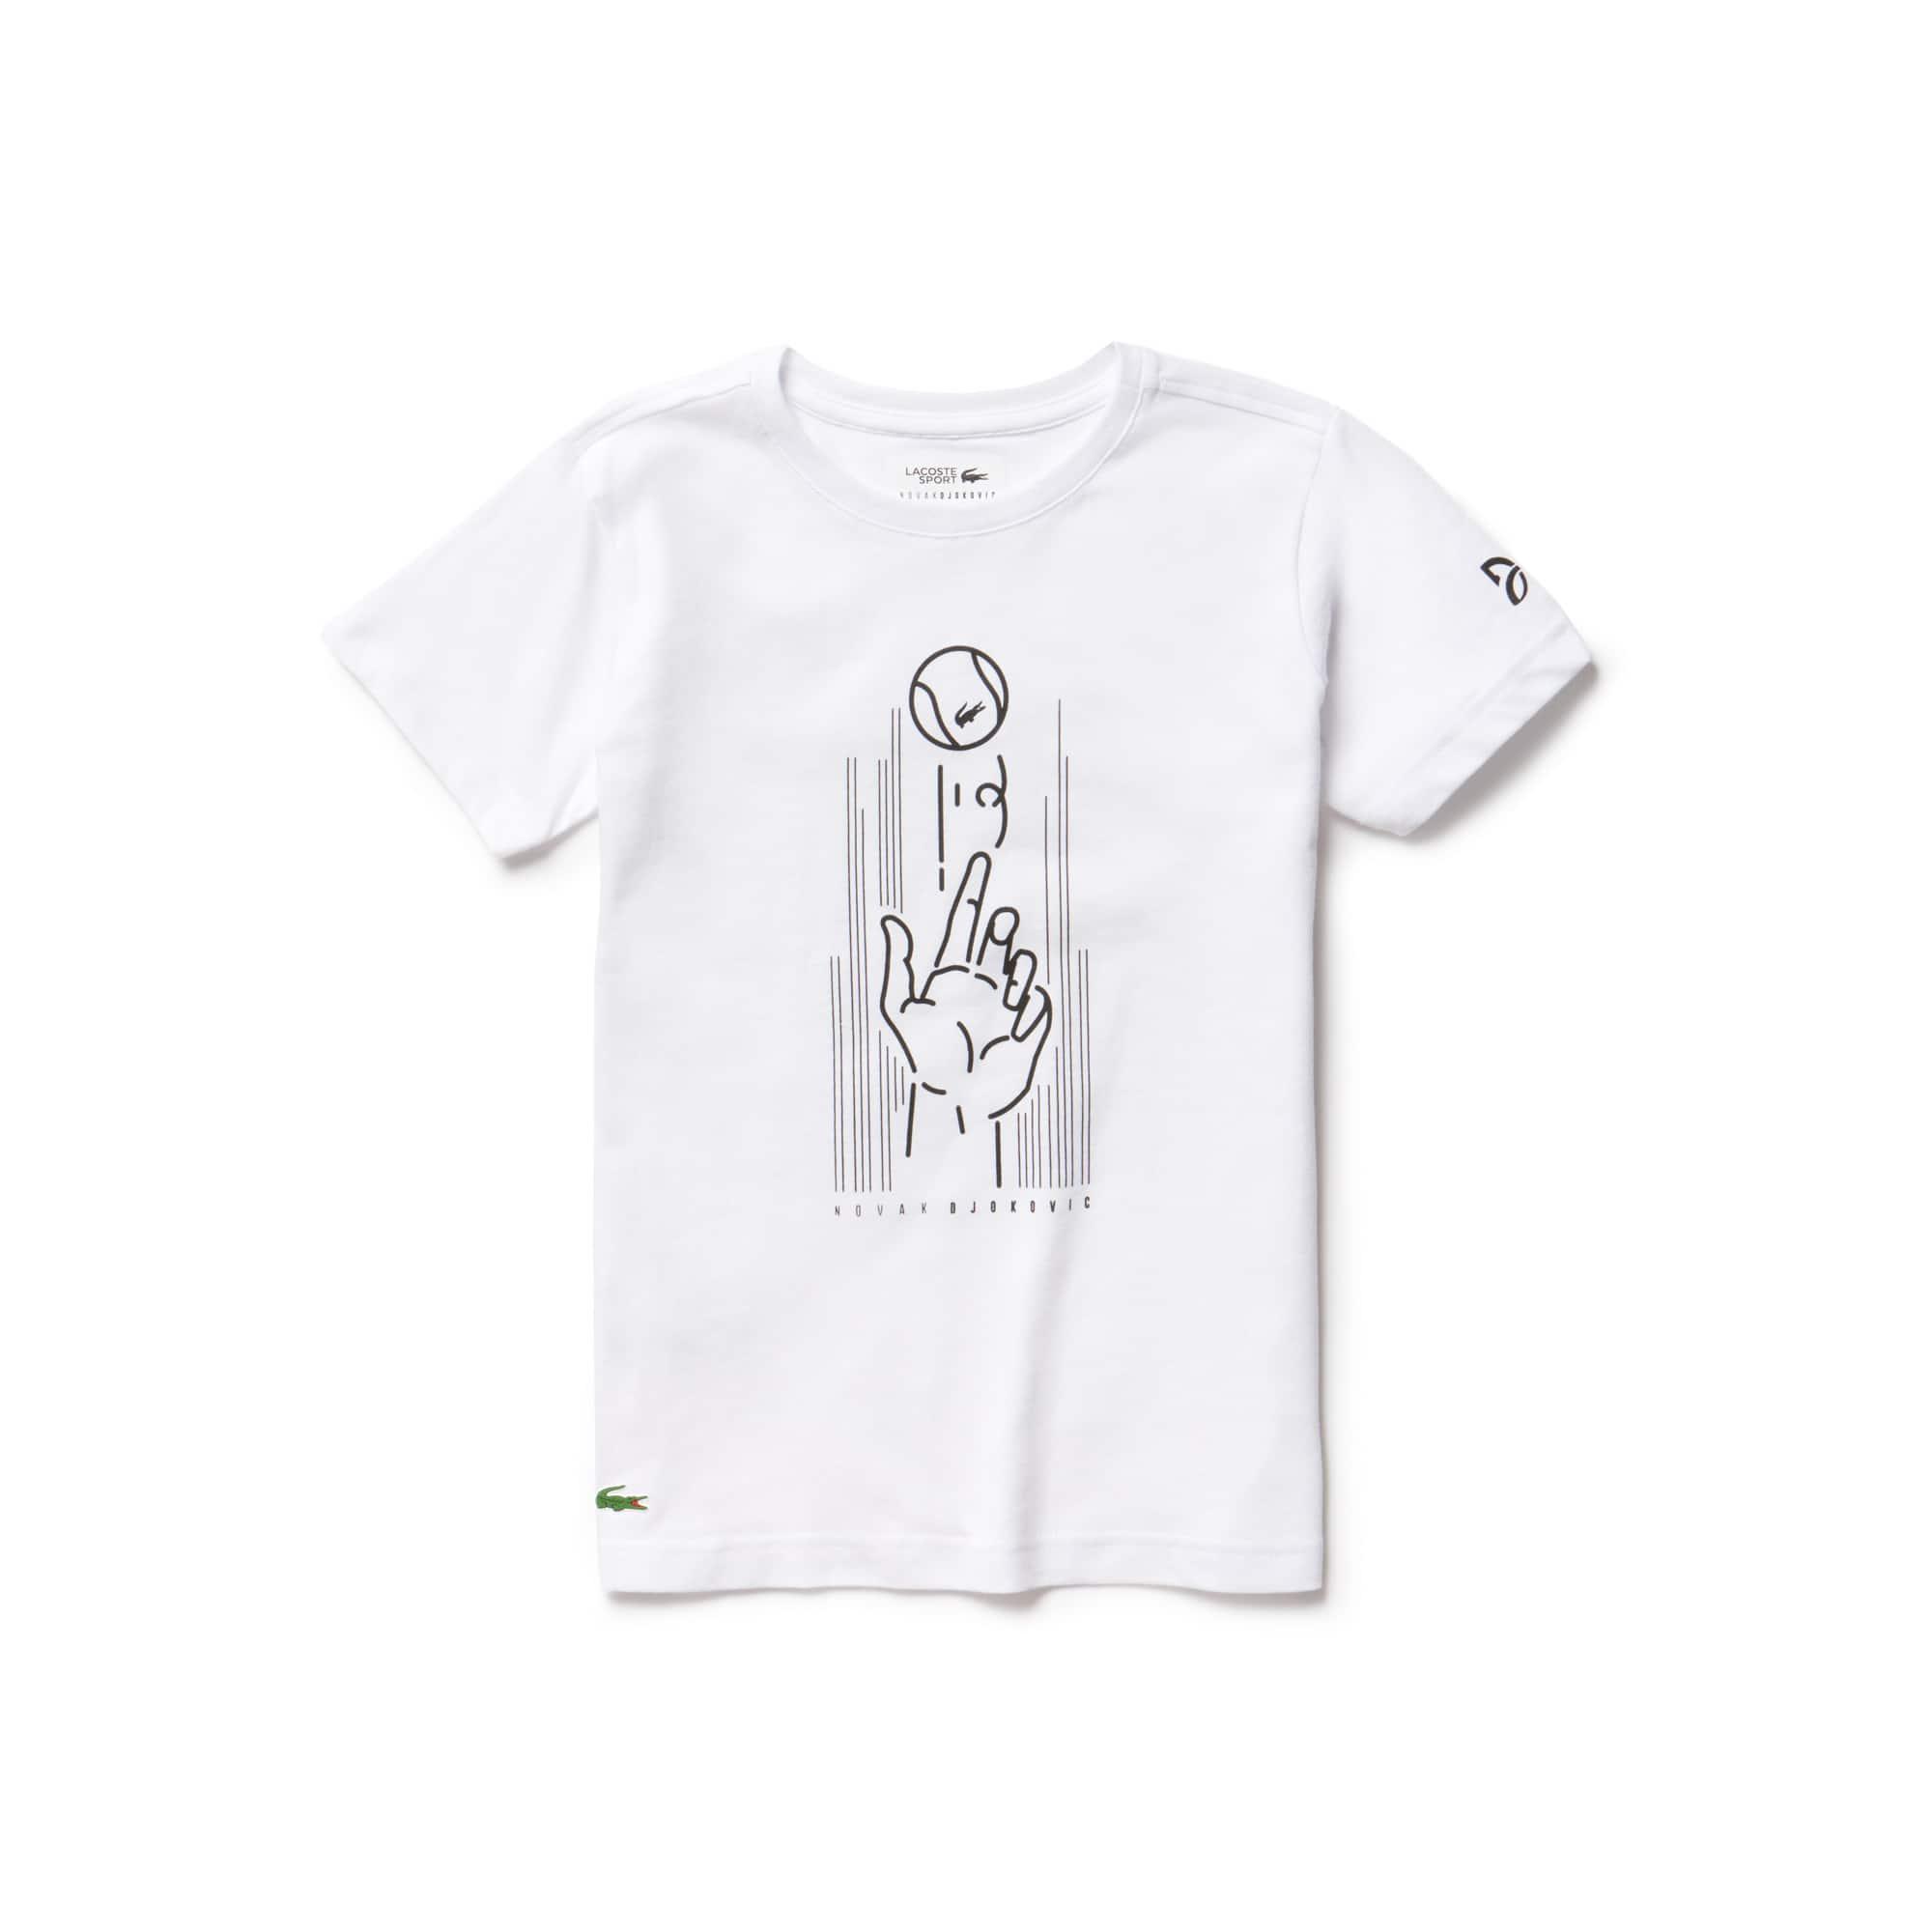 Jungen Jersey T-Shirt mit Aufdruck LACOSTE SPORT NOVAK DJOKOVIC